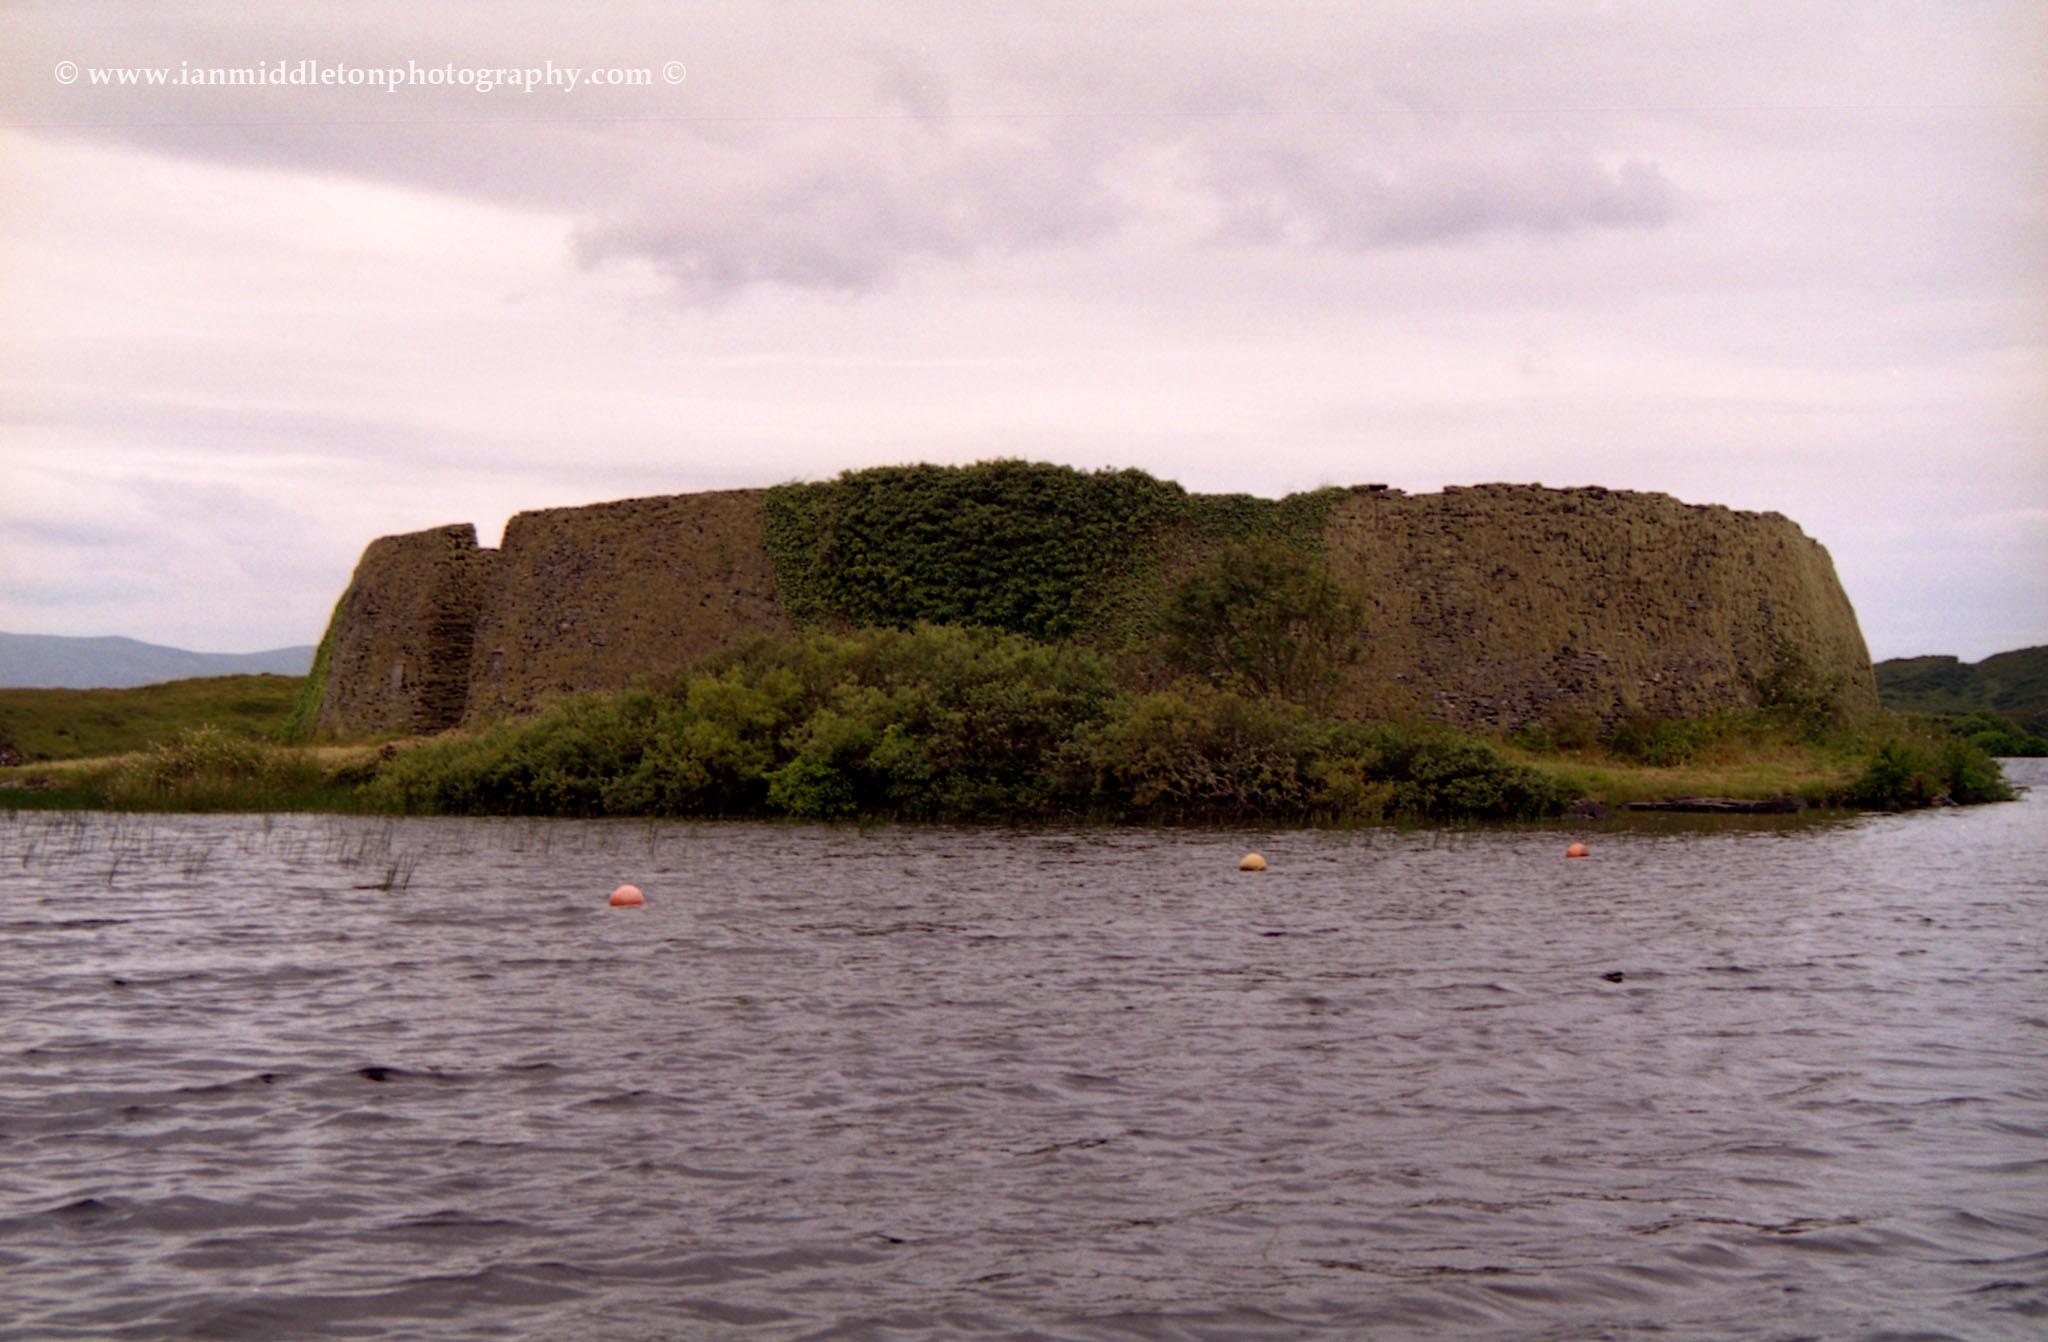 Doon fort on Loughdoon near Portnoo, County Donegal.